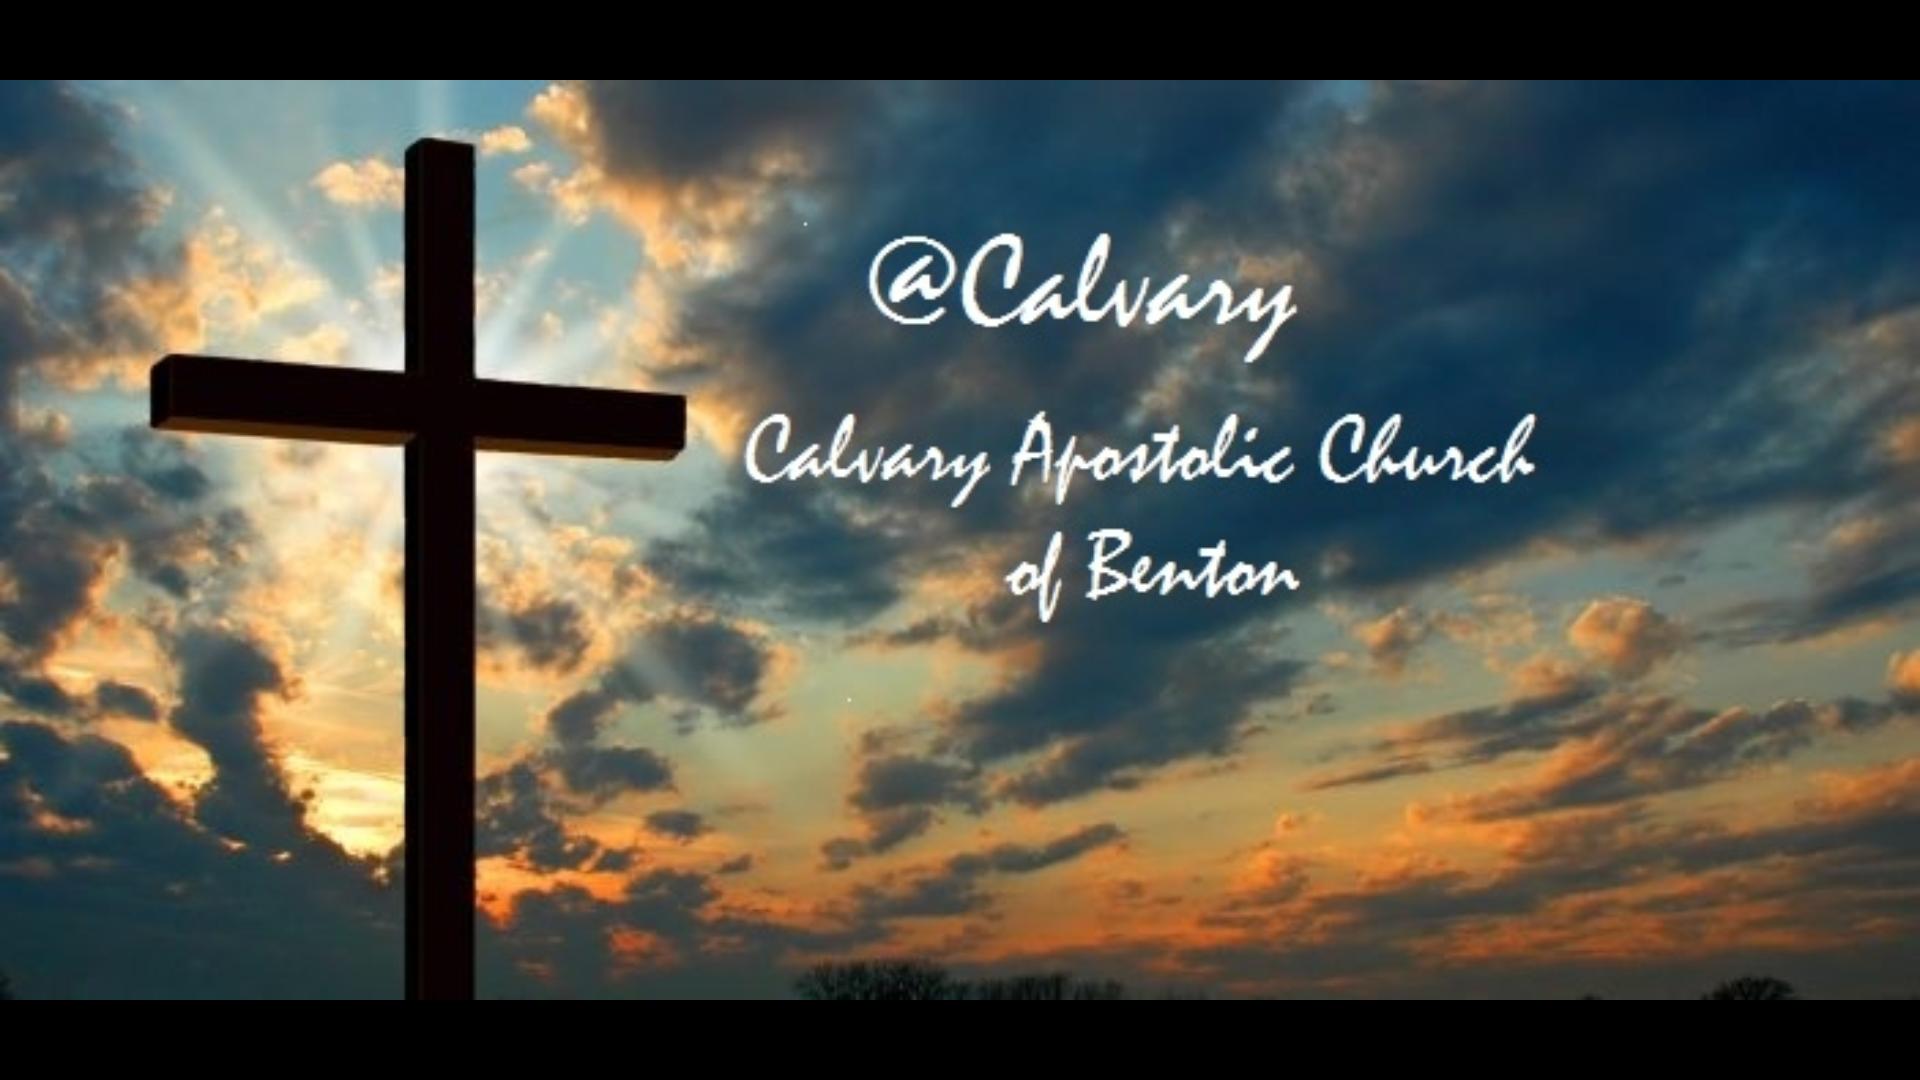 Activity - Calvary Apostolic Church of Benton - Faithlife